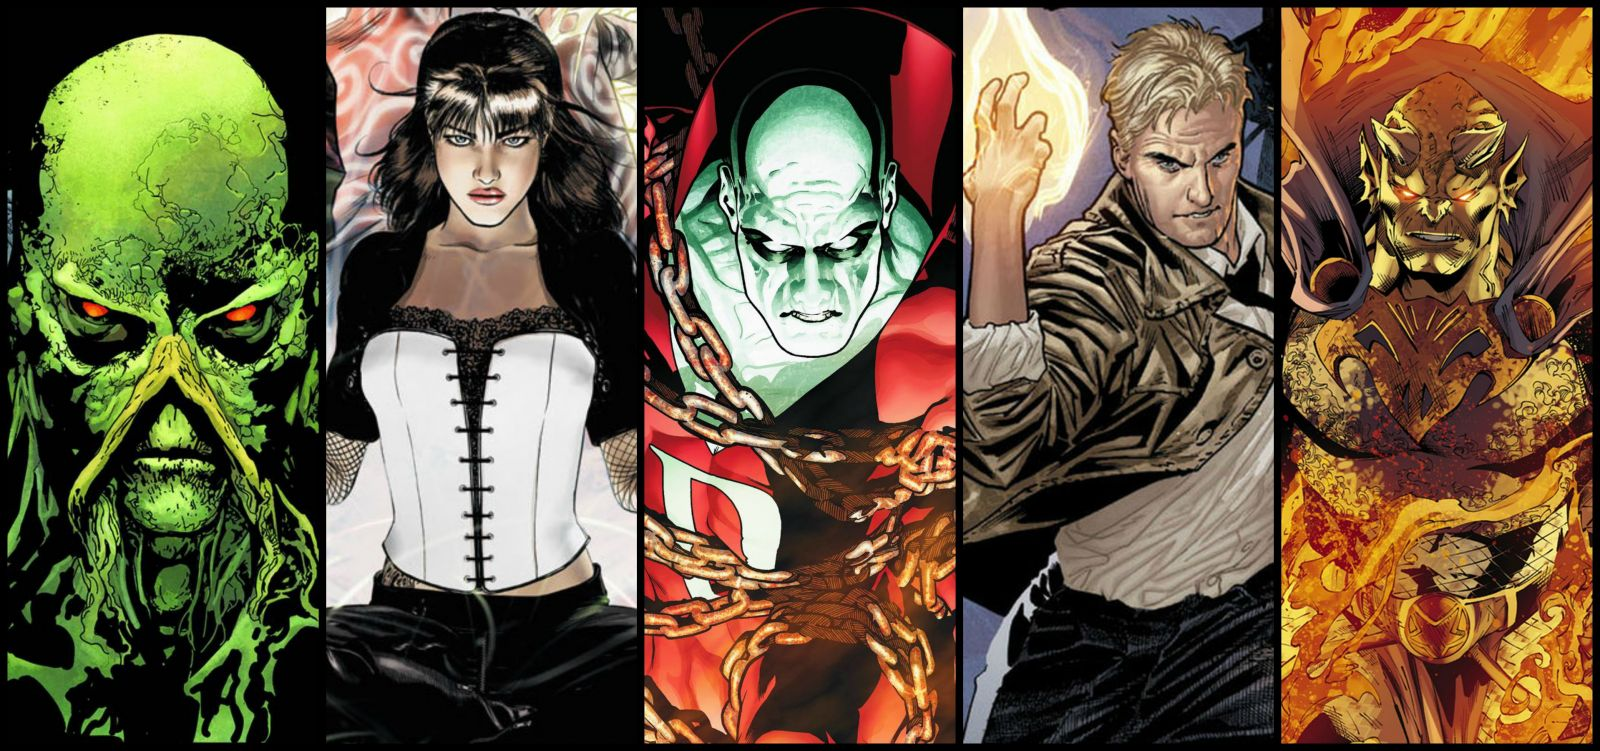 Justice League Darkтемная лига справедливостиbatgirl